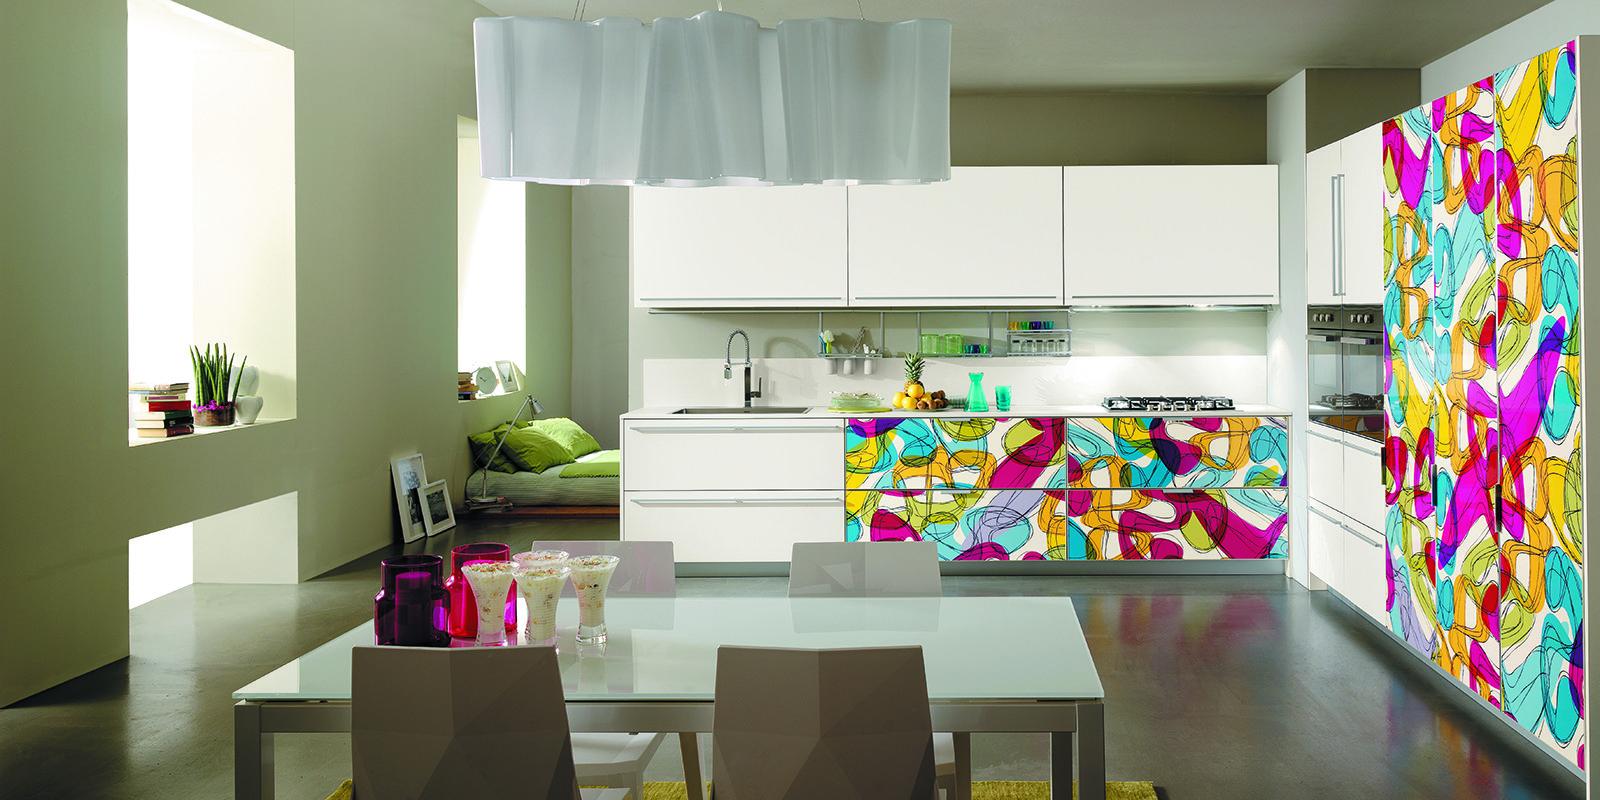 Disegno cucina moderna giugno 2015 : Voffca.com | Leroy Merlin Fioriere Ovali In Pietra